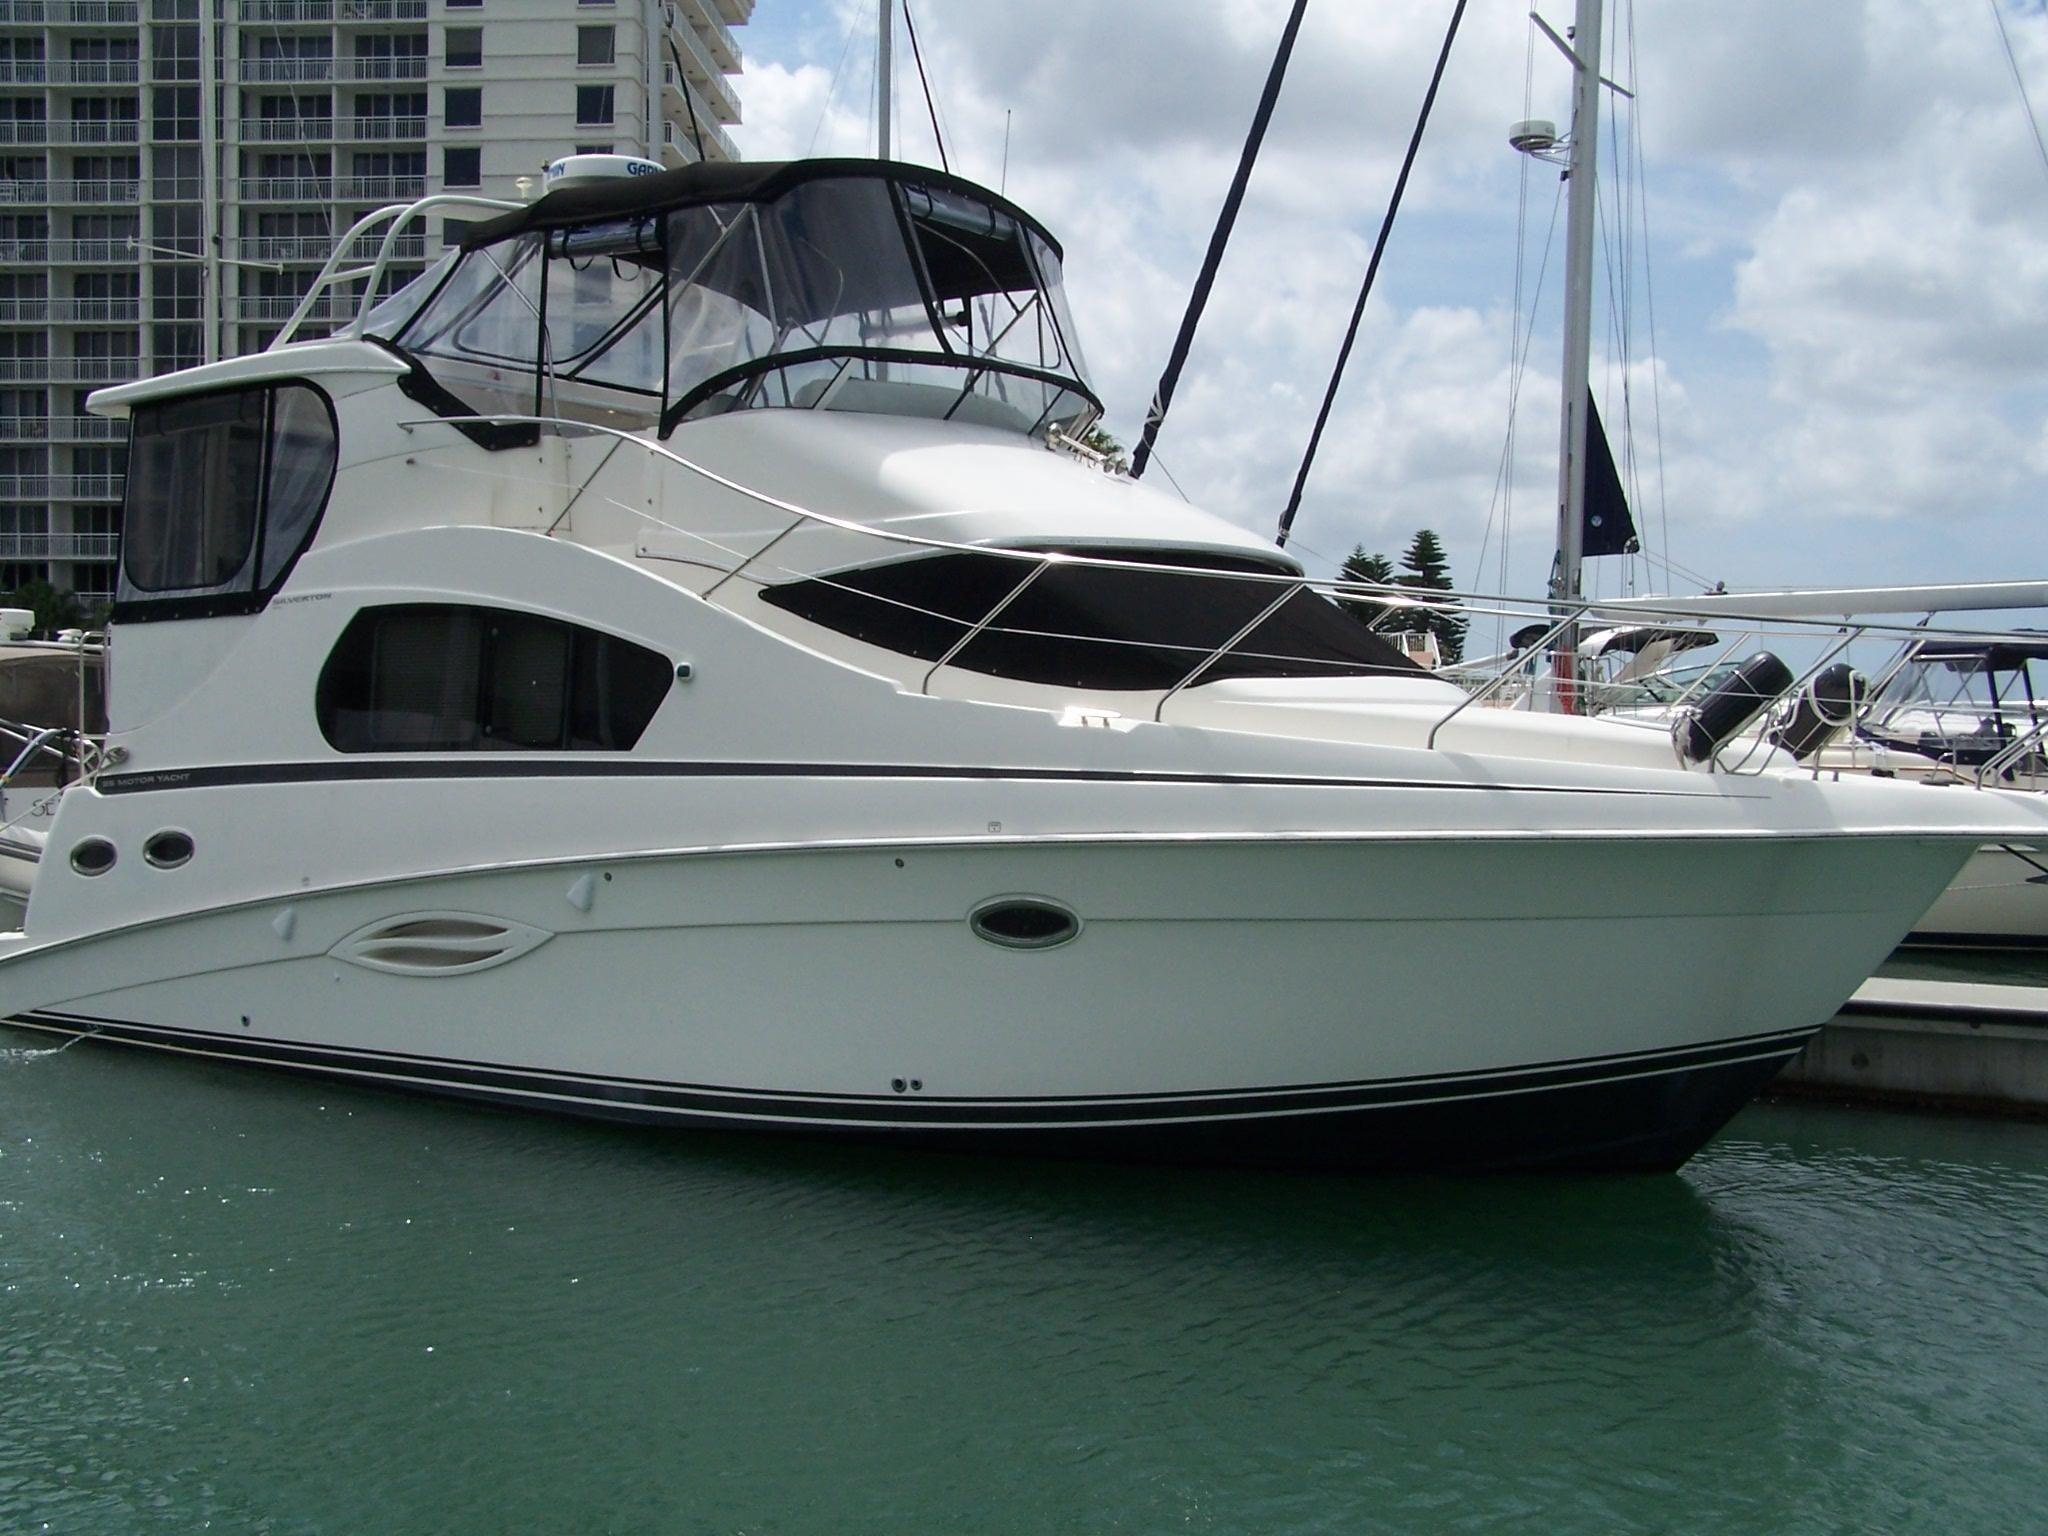 Silverton 35 Motor Yacht - Main Photo